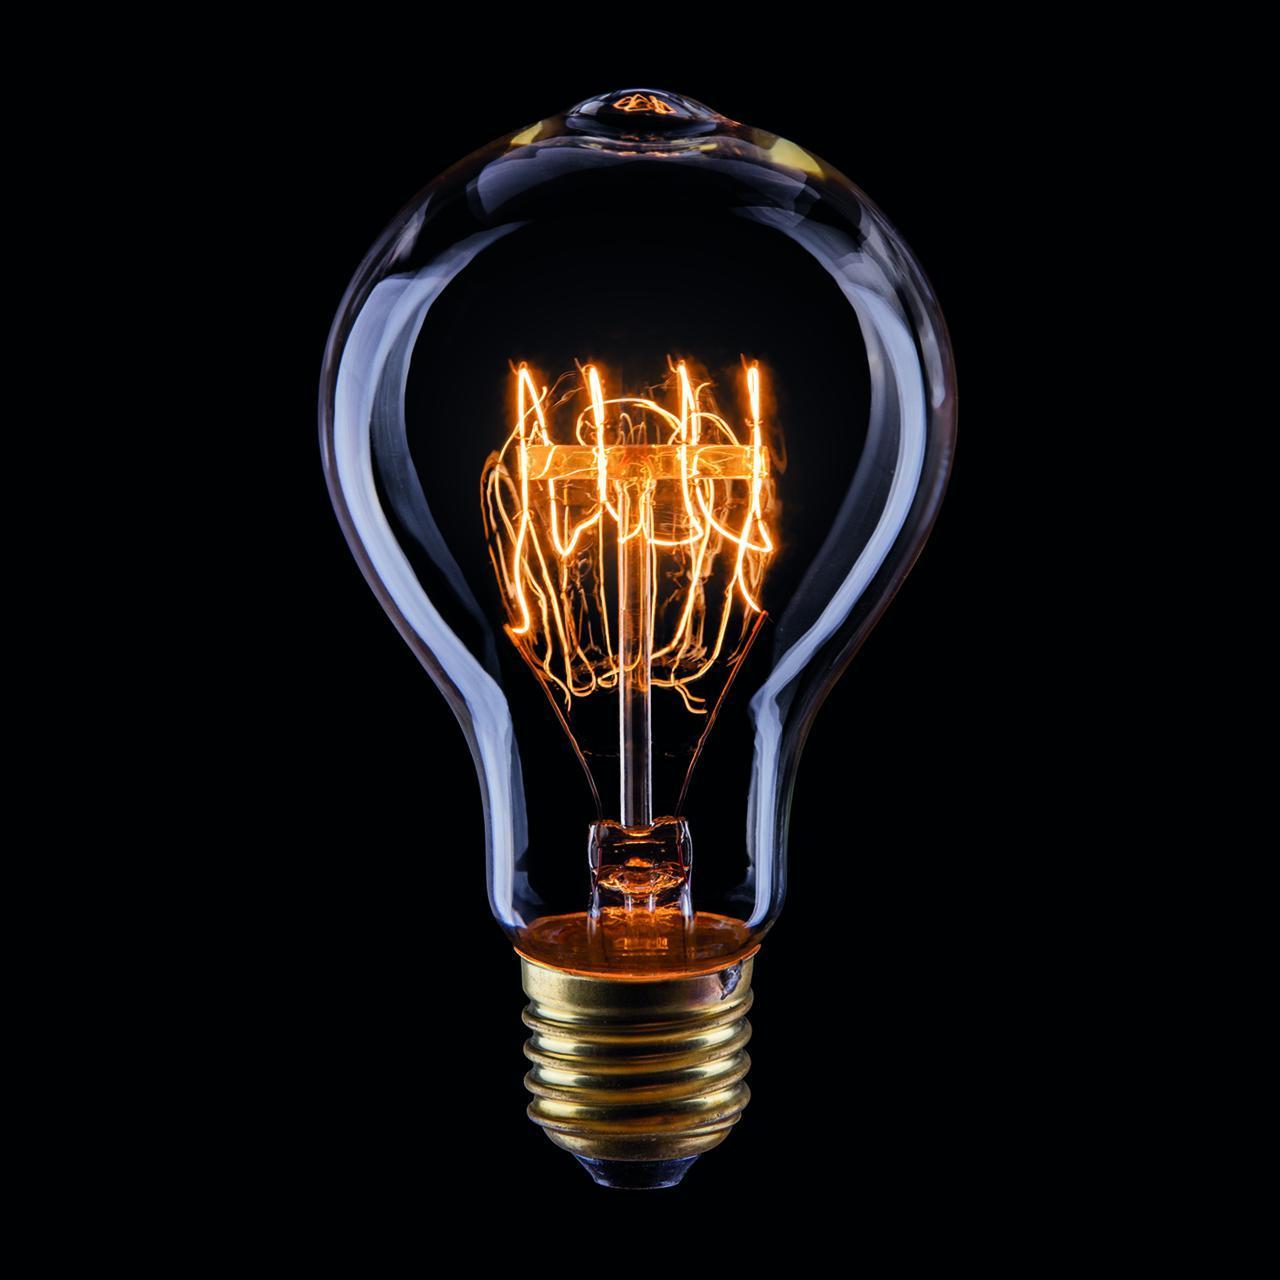 Лампа накаливания E27 40W прозрачная VG6-A75A3-40W 5930 voltega лампа накаливания voltega loft груша прозрачная e27 40w br30 2200k vg6 br30a5 40w 6496